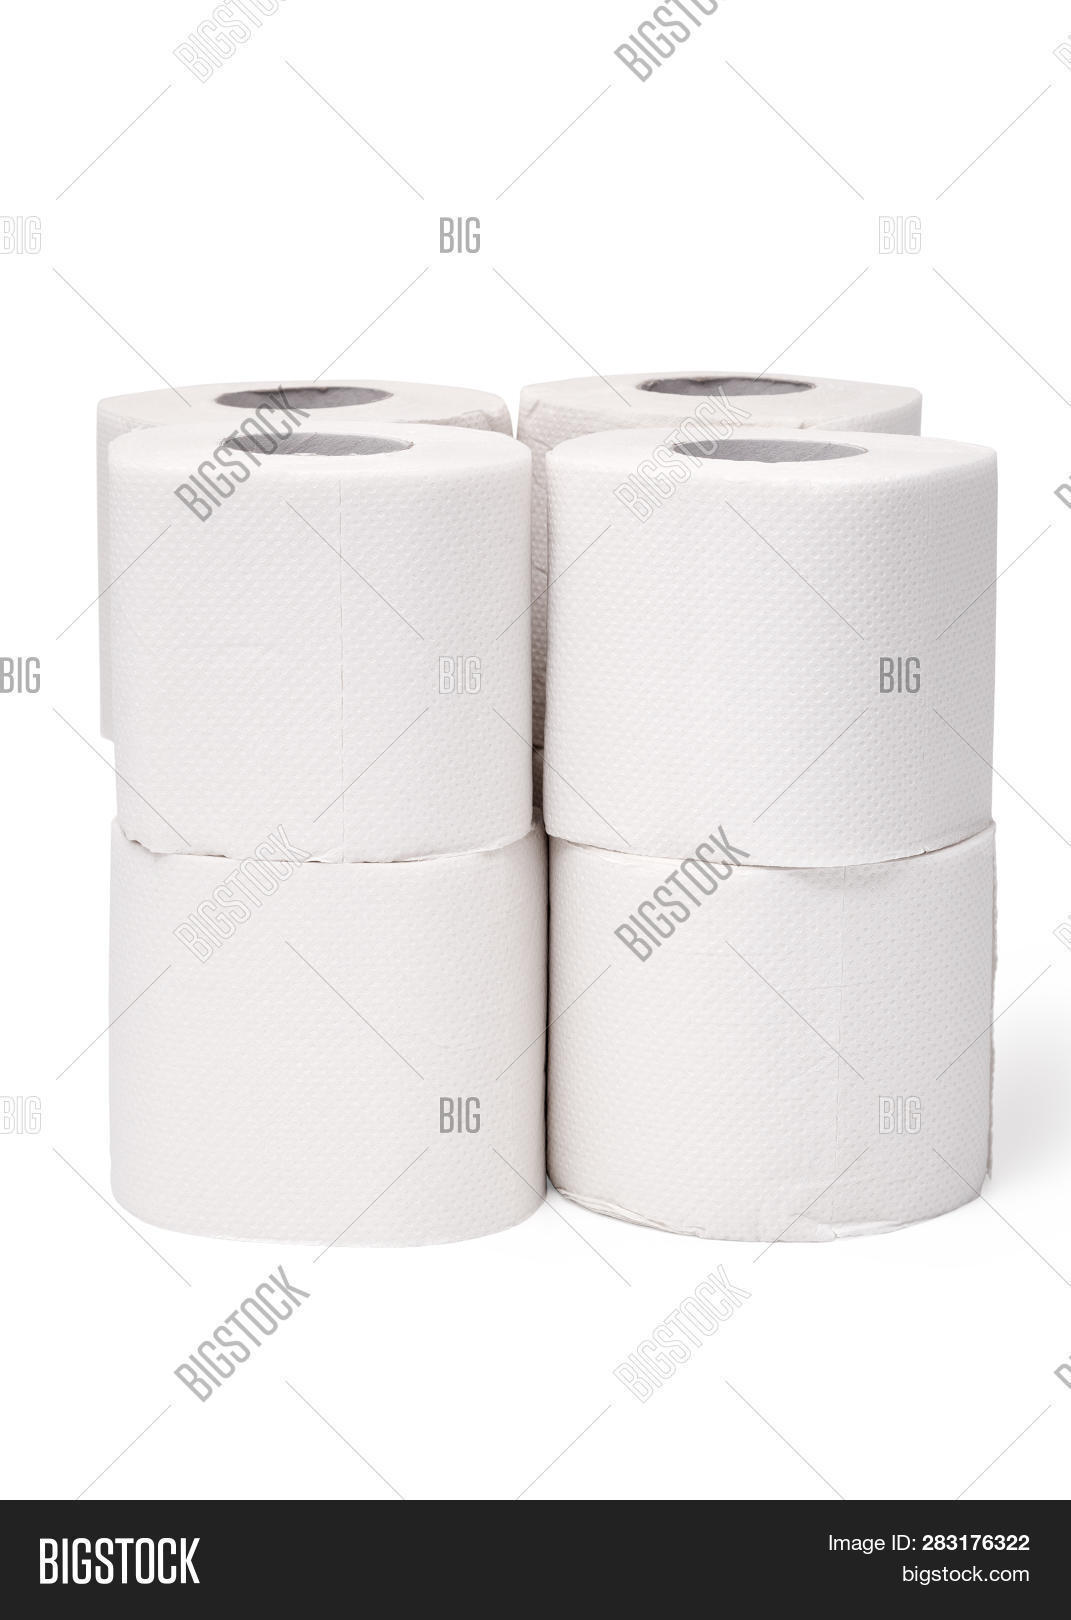 Clean White Tissue Image Photo Free Trial Bigstock